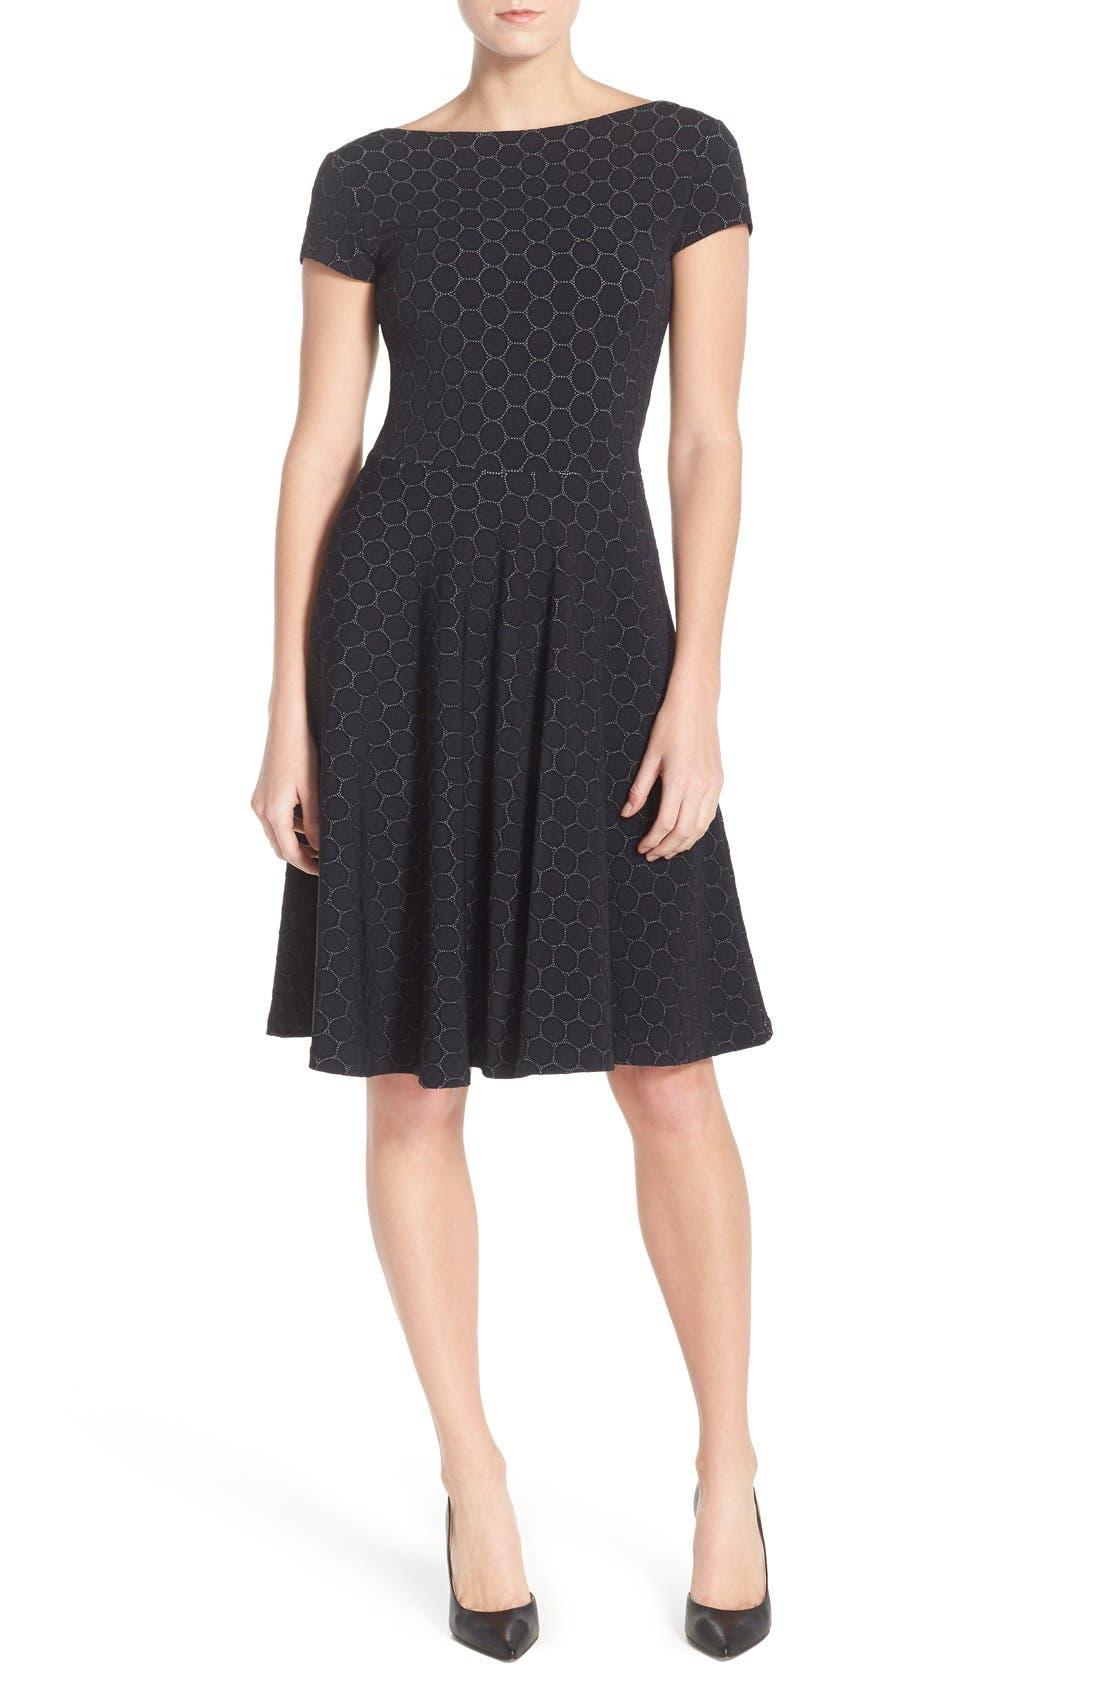 LEOTA, 'Circle' Jacquard Woven Jersey Dress, Main thumbnail 1, color, BLACK CAMEO CLOTH